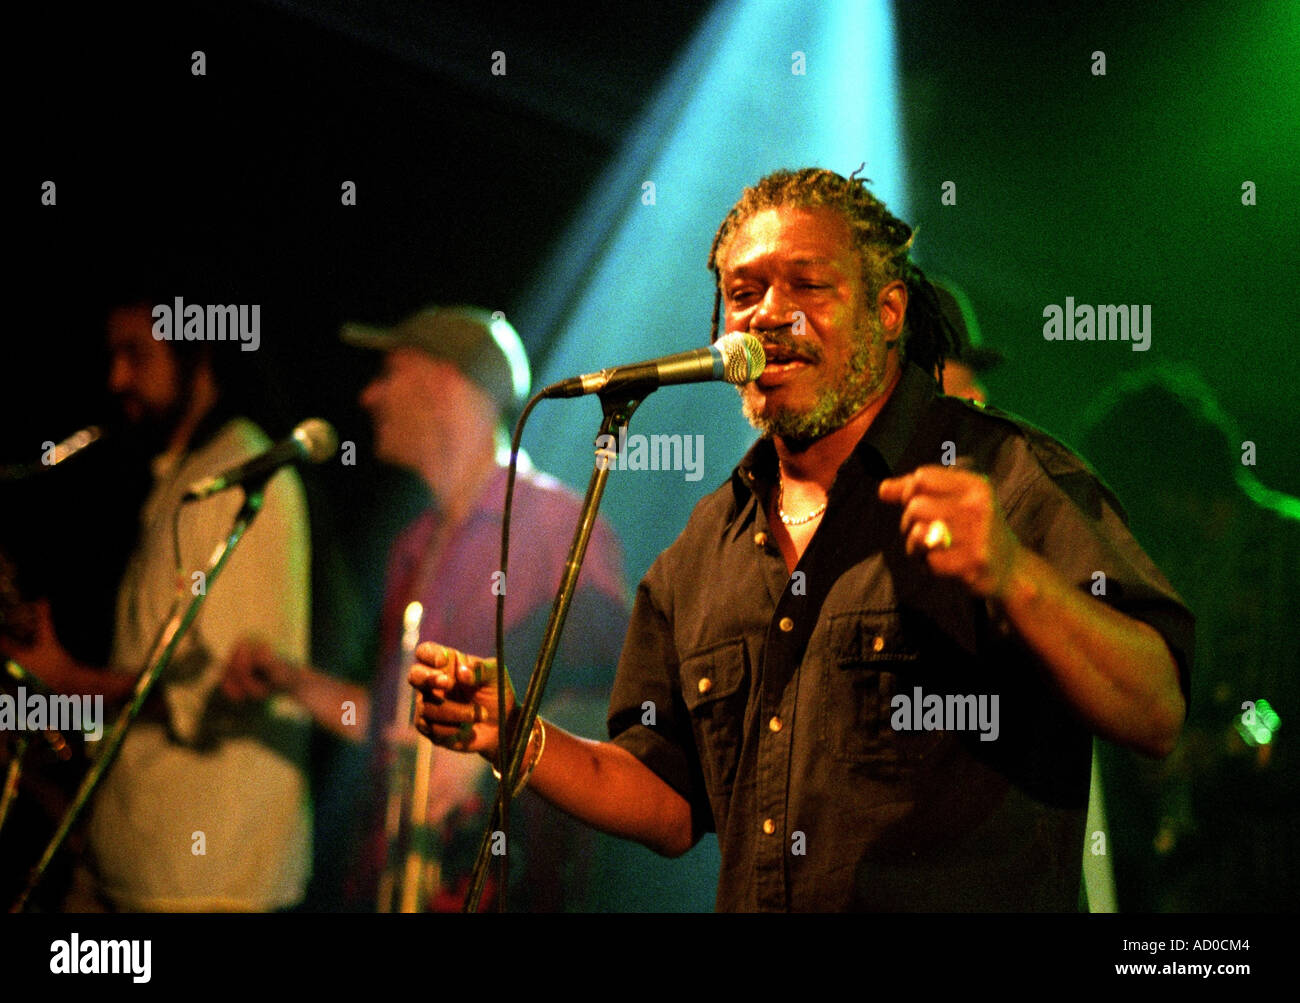 Horace Andy, reggae musician, in concert, Buttermarket, Shrewsbury, UK 2004. - Stock Image